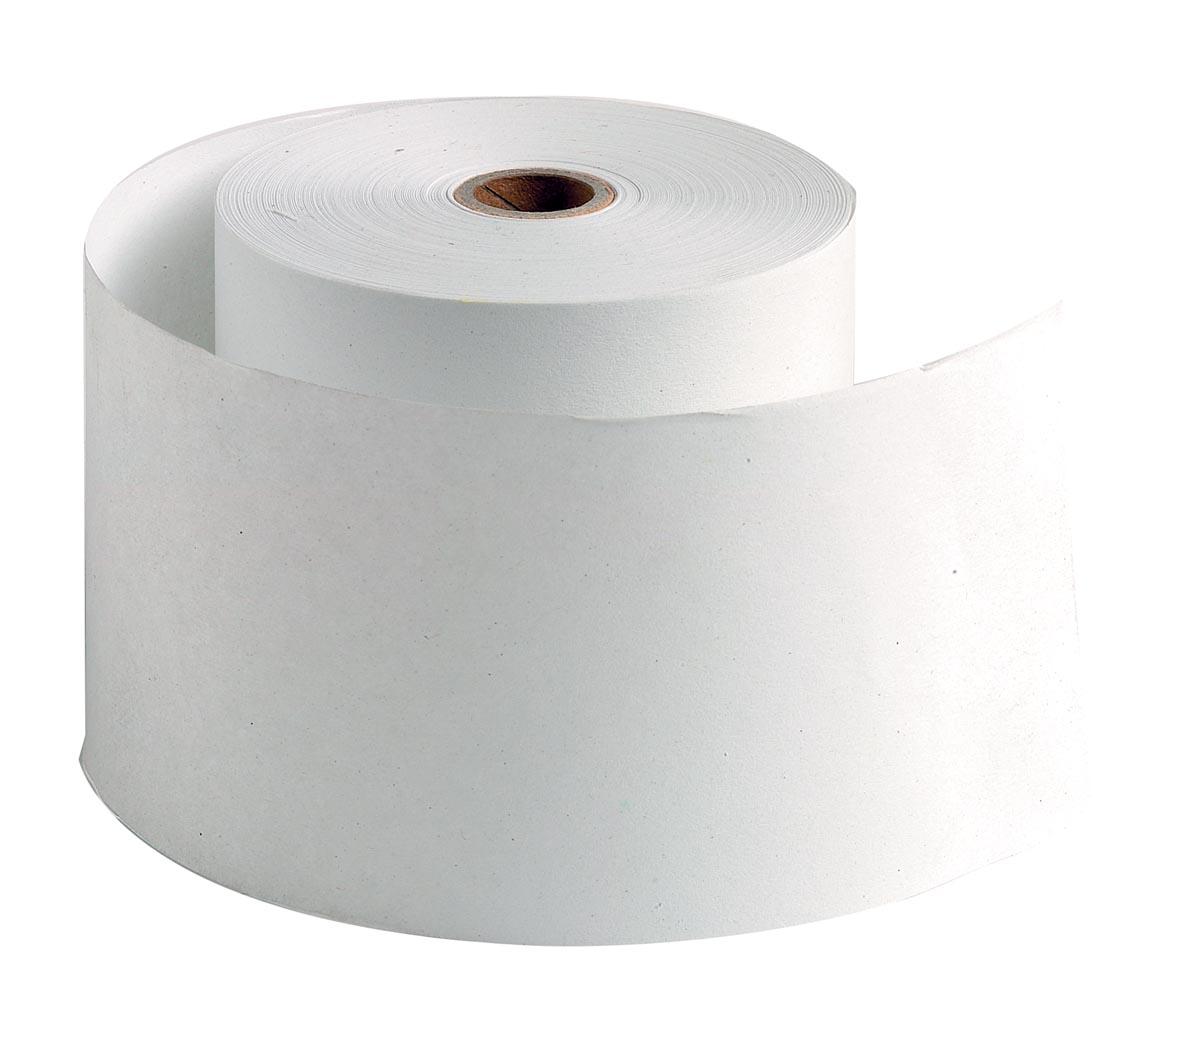 Rekenrol ft 57 mm, diameter +-30 mm, asgat 8 mm, lengte 8 meter